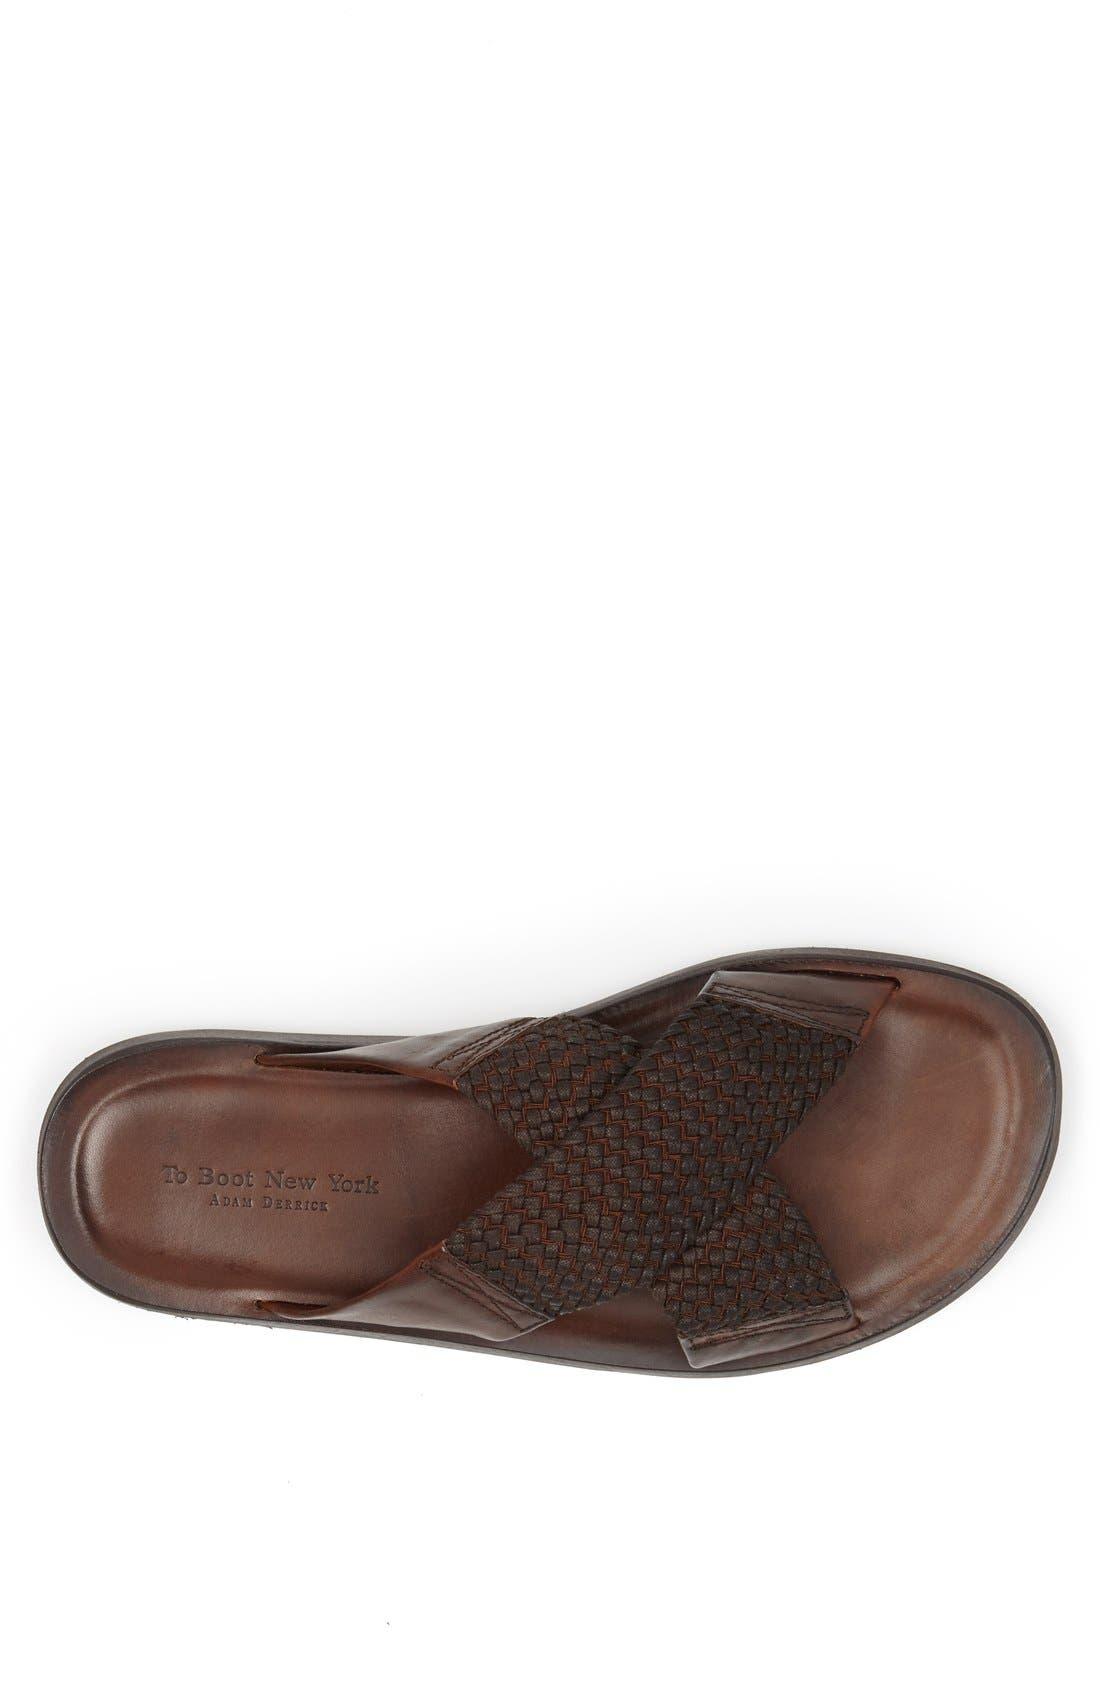 Alternate Image 3  - To Boot New York 'Ibiza' Leather Slide Sandal